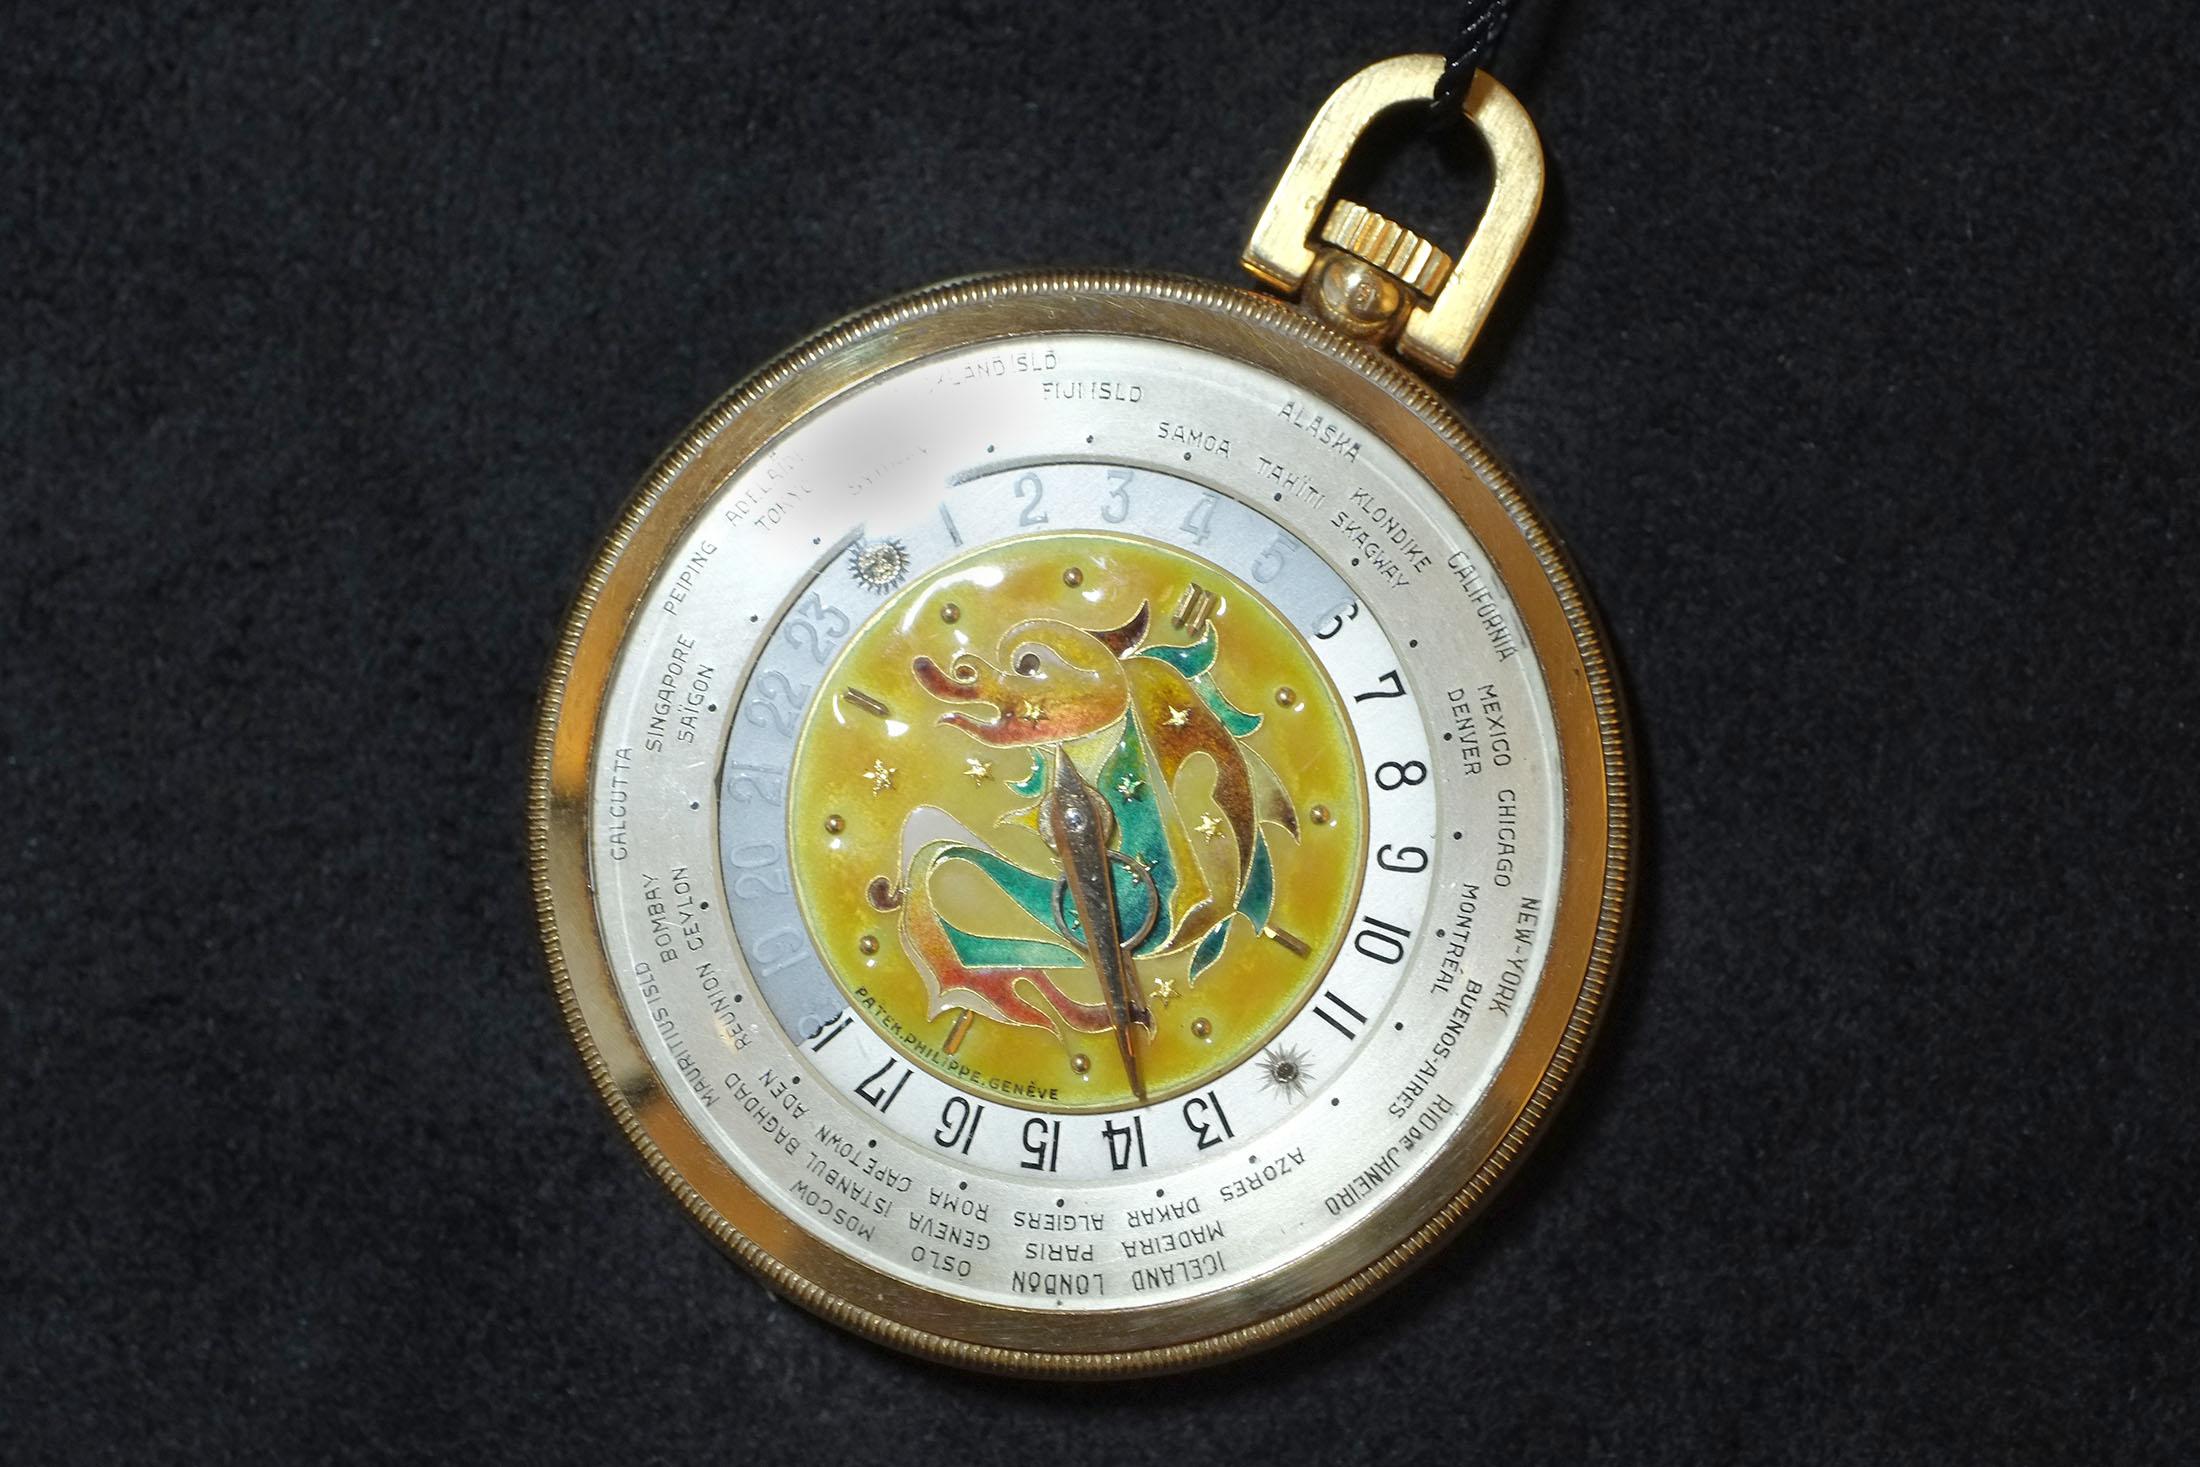 Patek Philippe Dragon Enamel Pocket Watch (Lot 164)